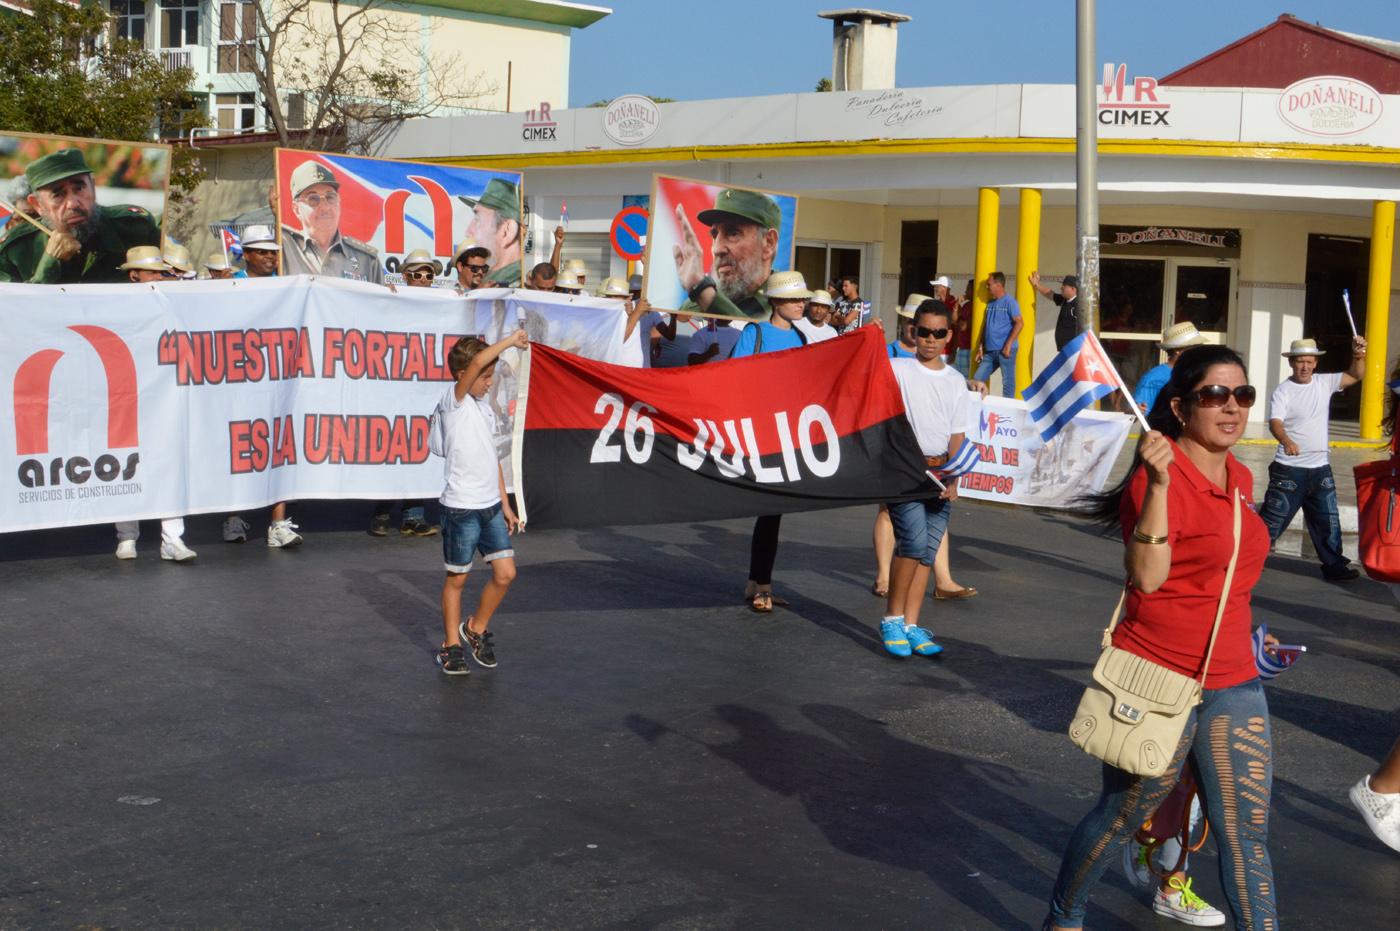 Varadero-May-Workers-Day-parade-Fidel.jpg